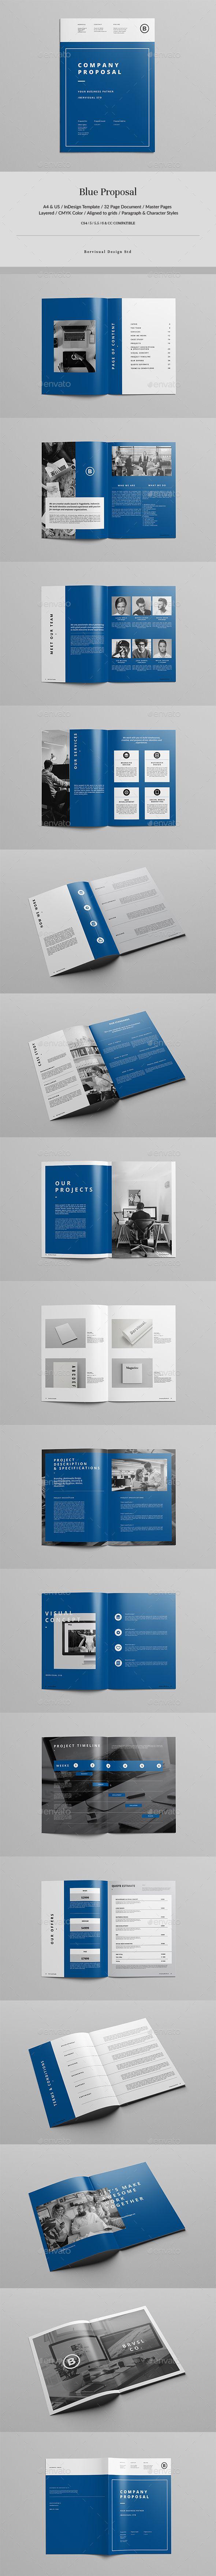 Blue #Proposal - Corporate #Brochures Download here: https://graphicriver.net/item/blue-proposal/19608778?ref=alena994